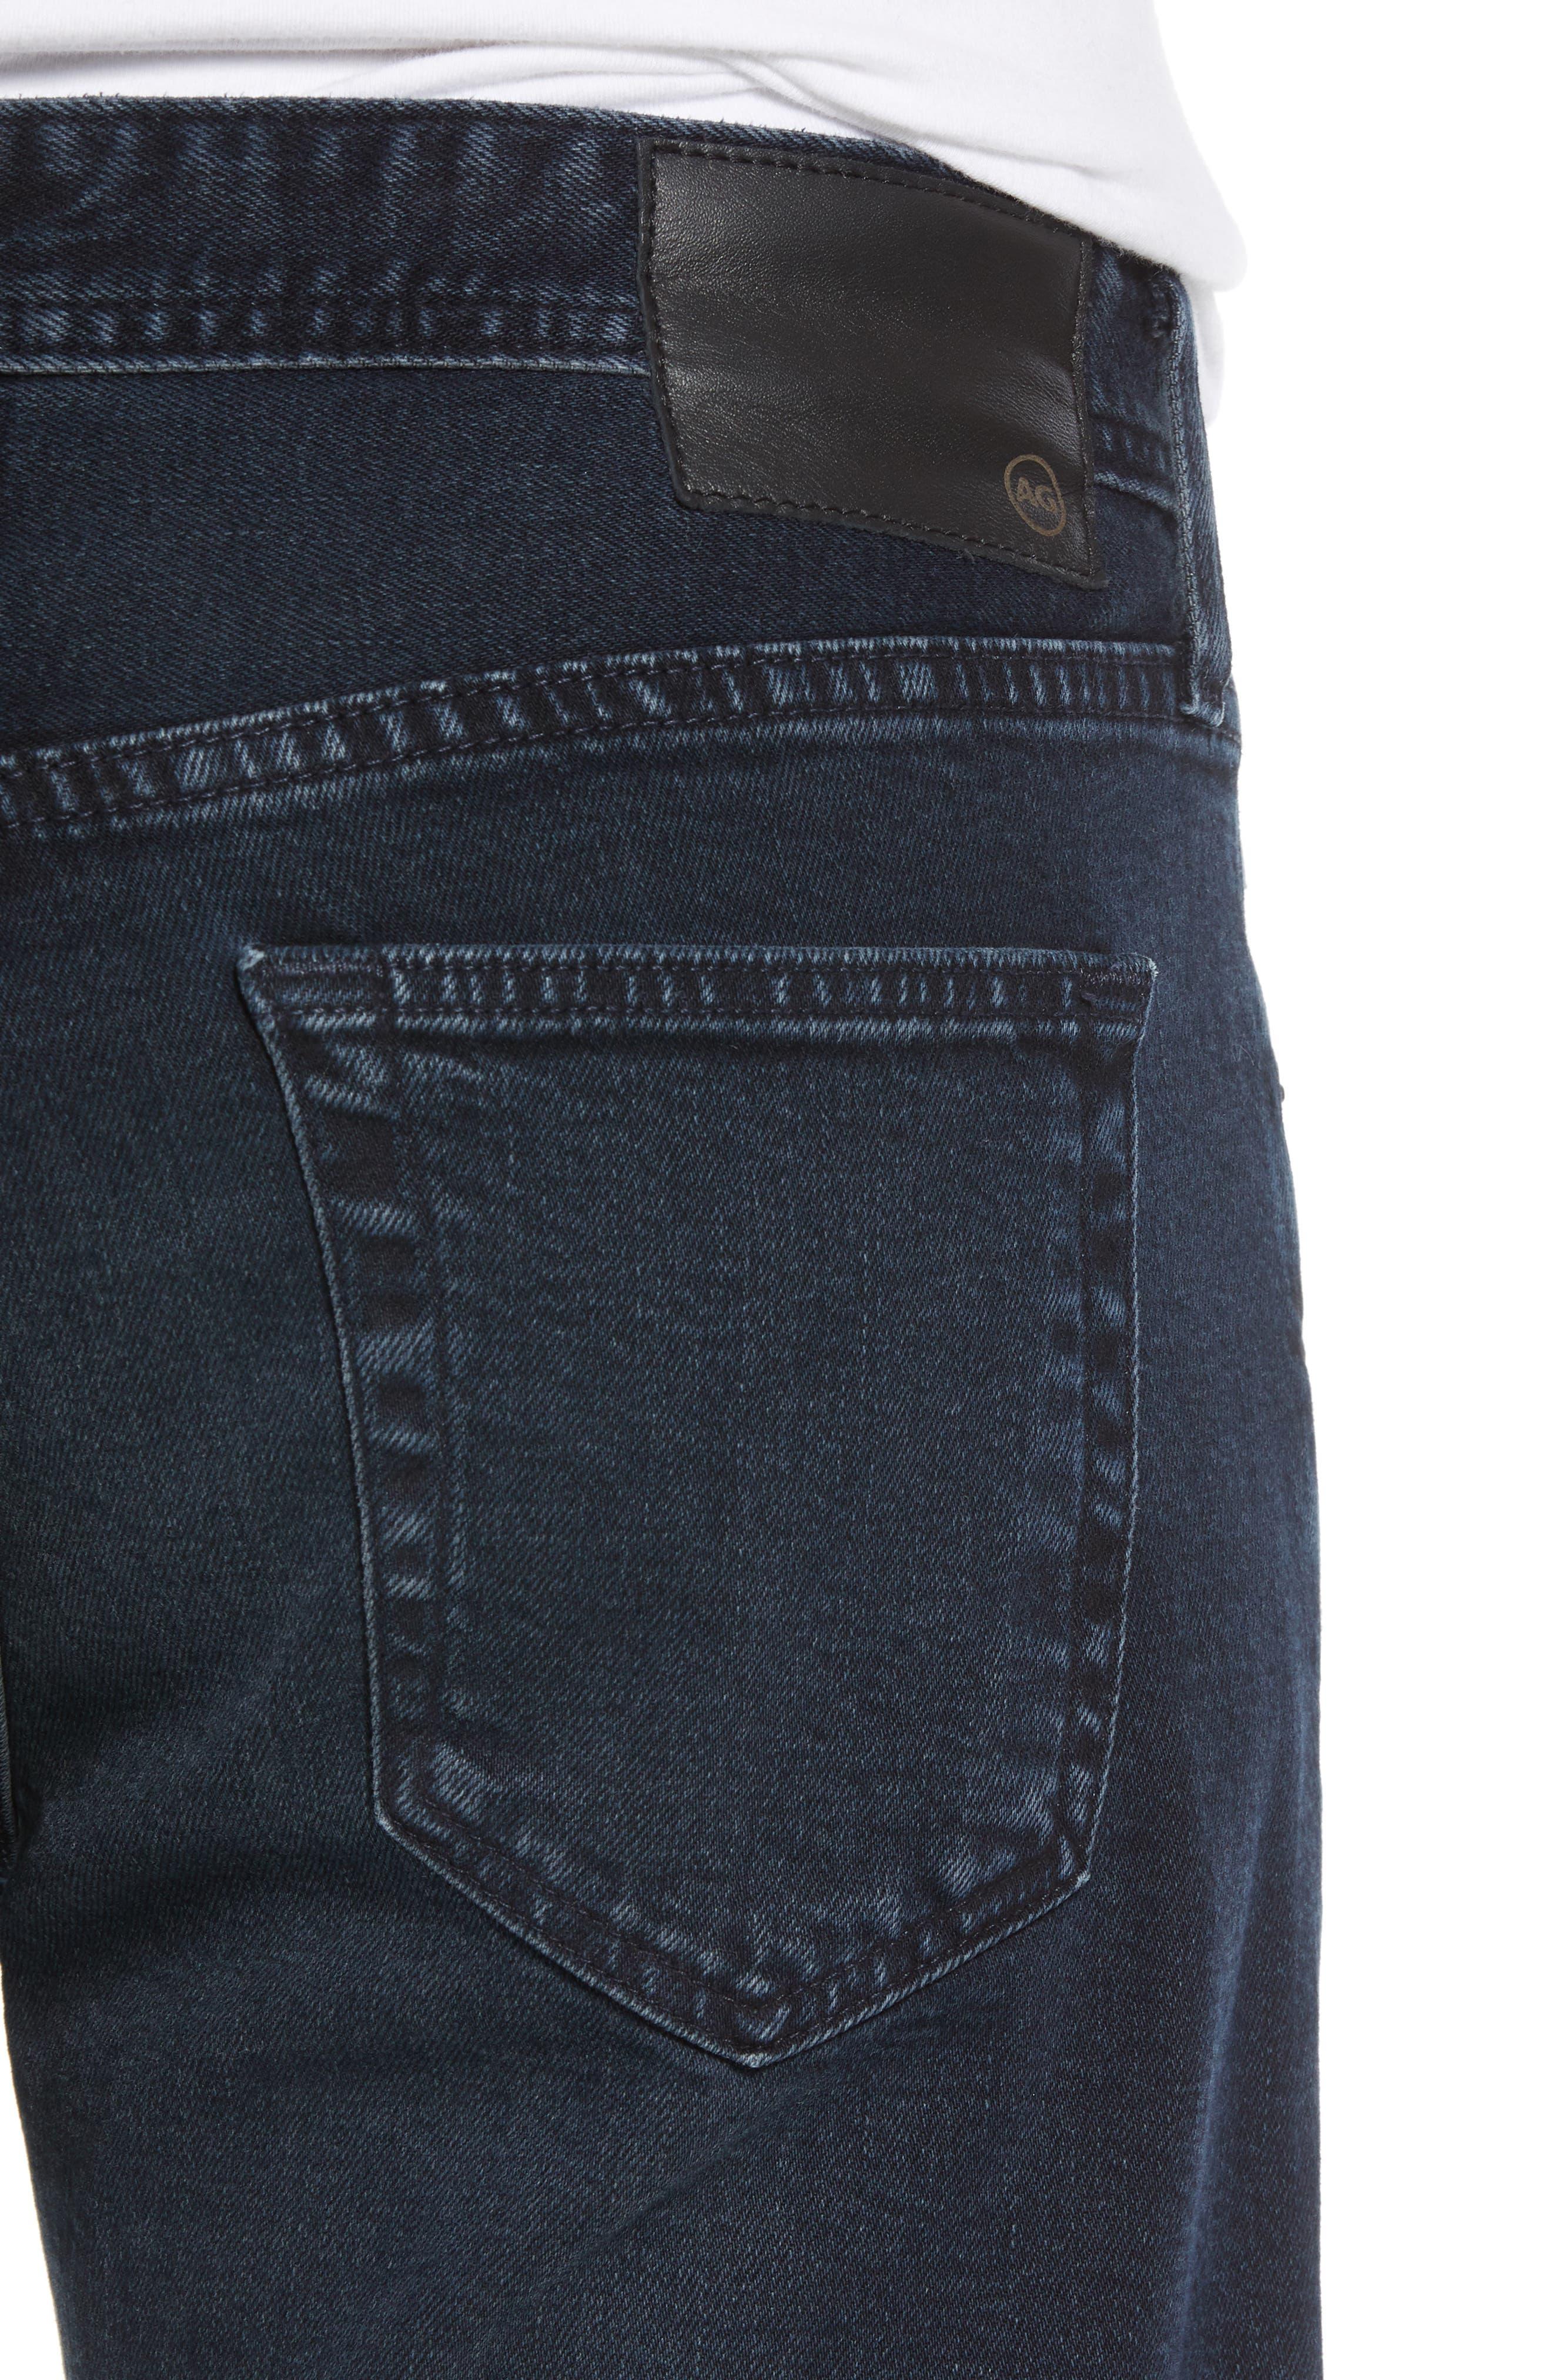 Tellis Slim Fit Jeans,                             Alternate thumbnail 4, color,                             2 YEARS RUMBLE